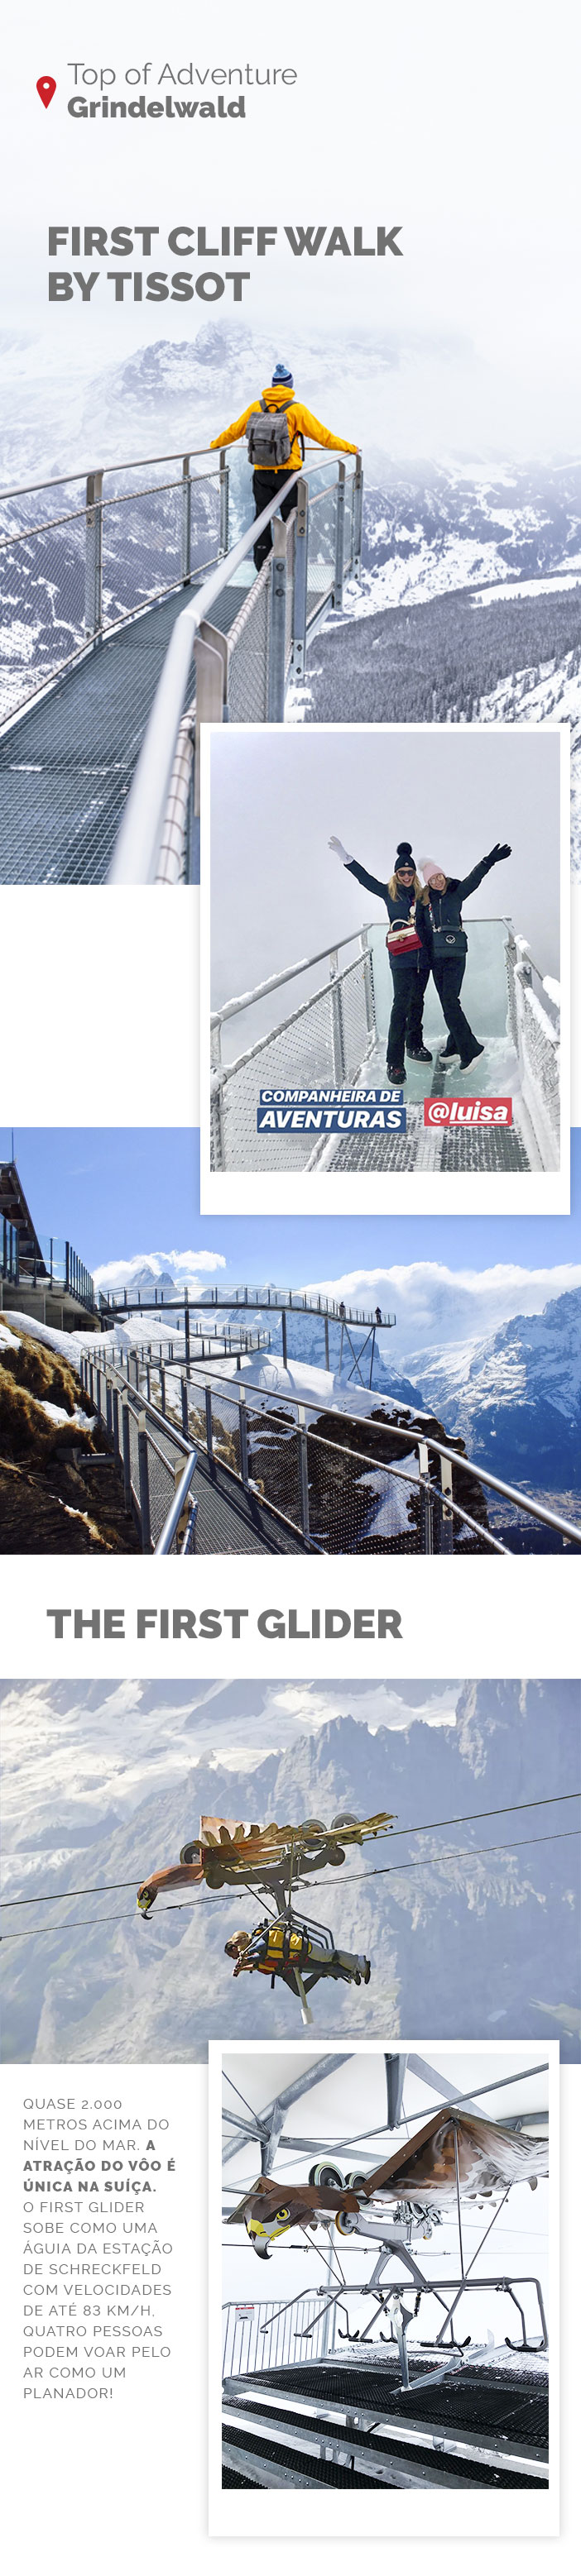 Viagem para Suíça - Dicas de Interlaken Grindelwald - First Cliff Walk - The First Glider